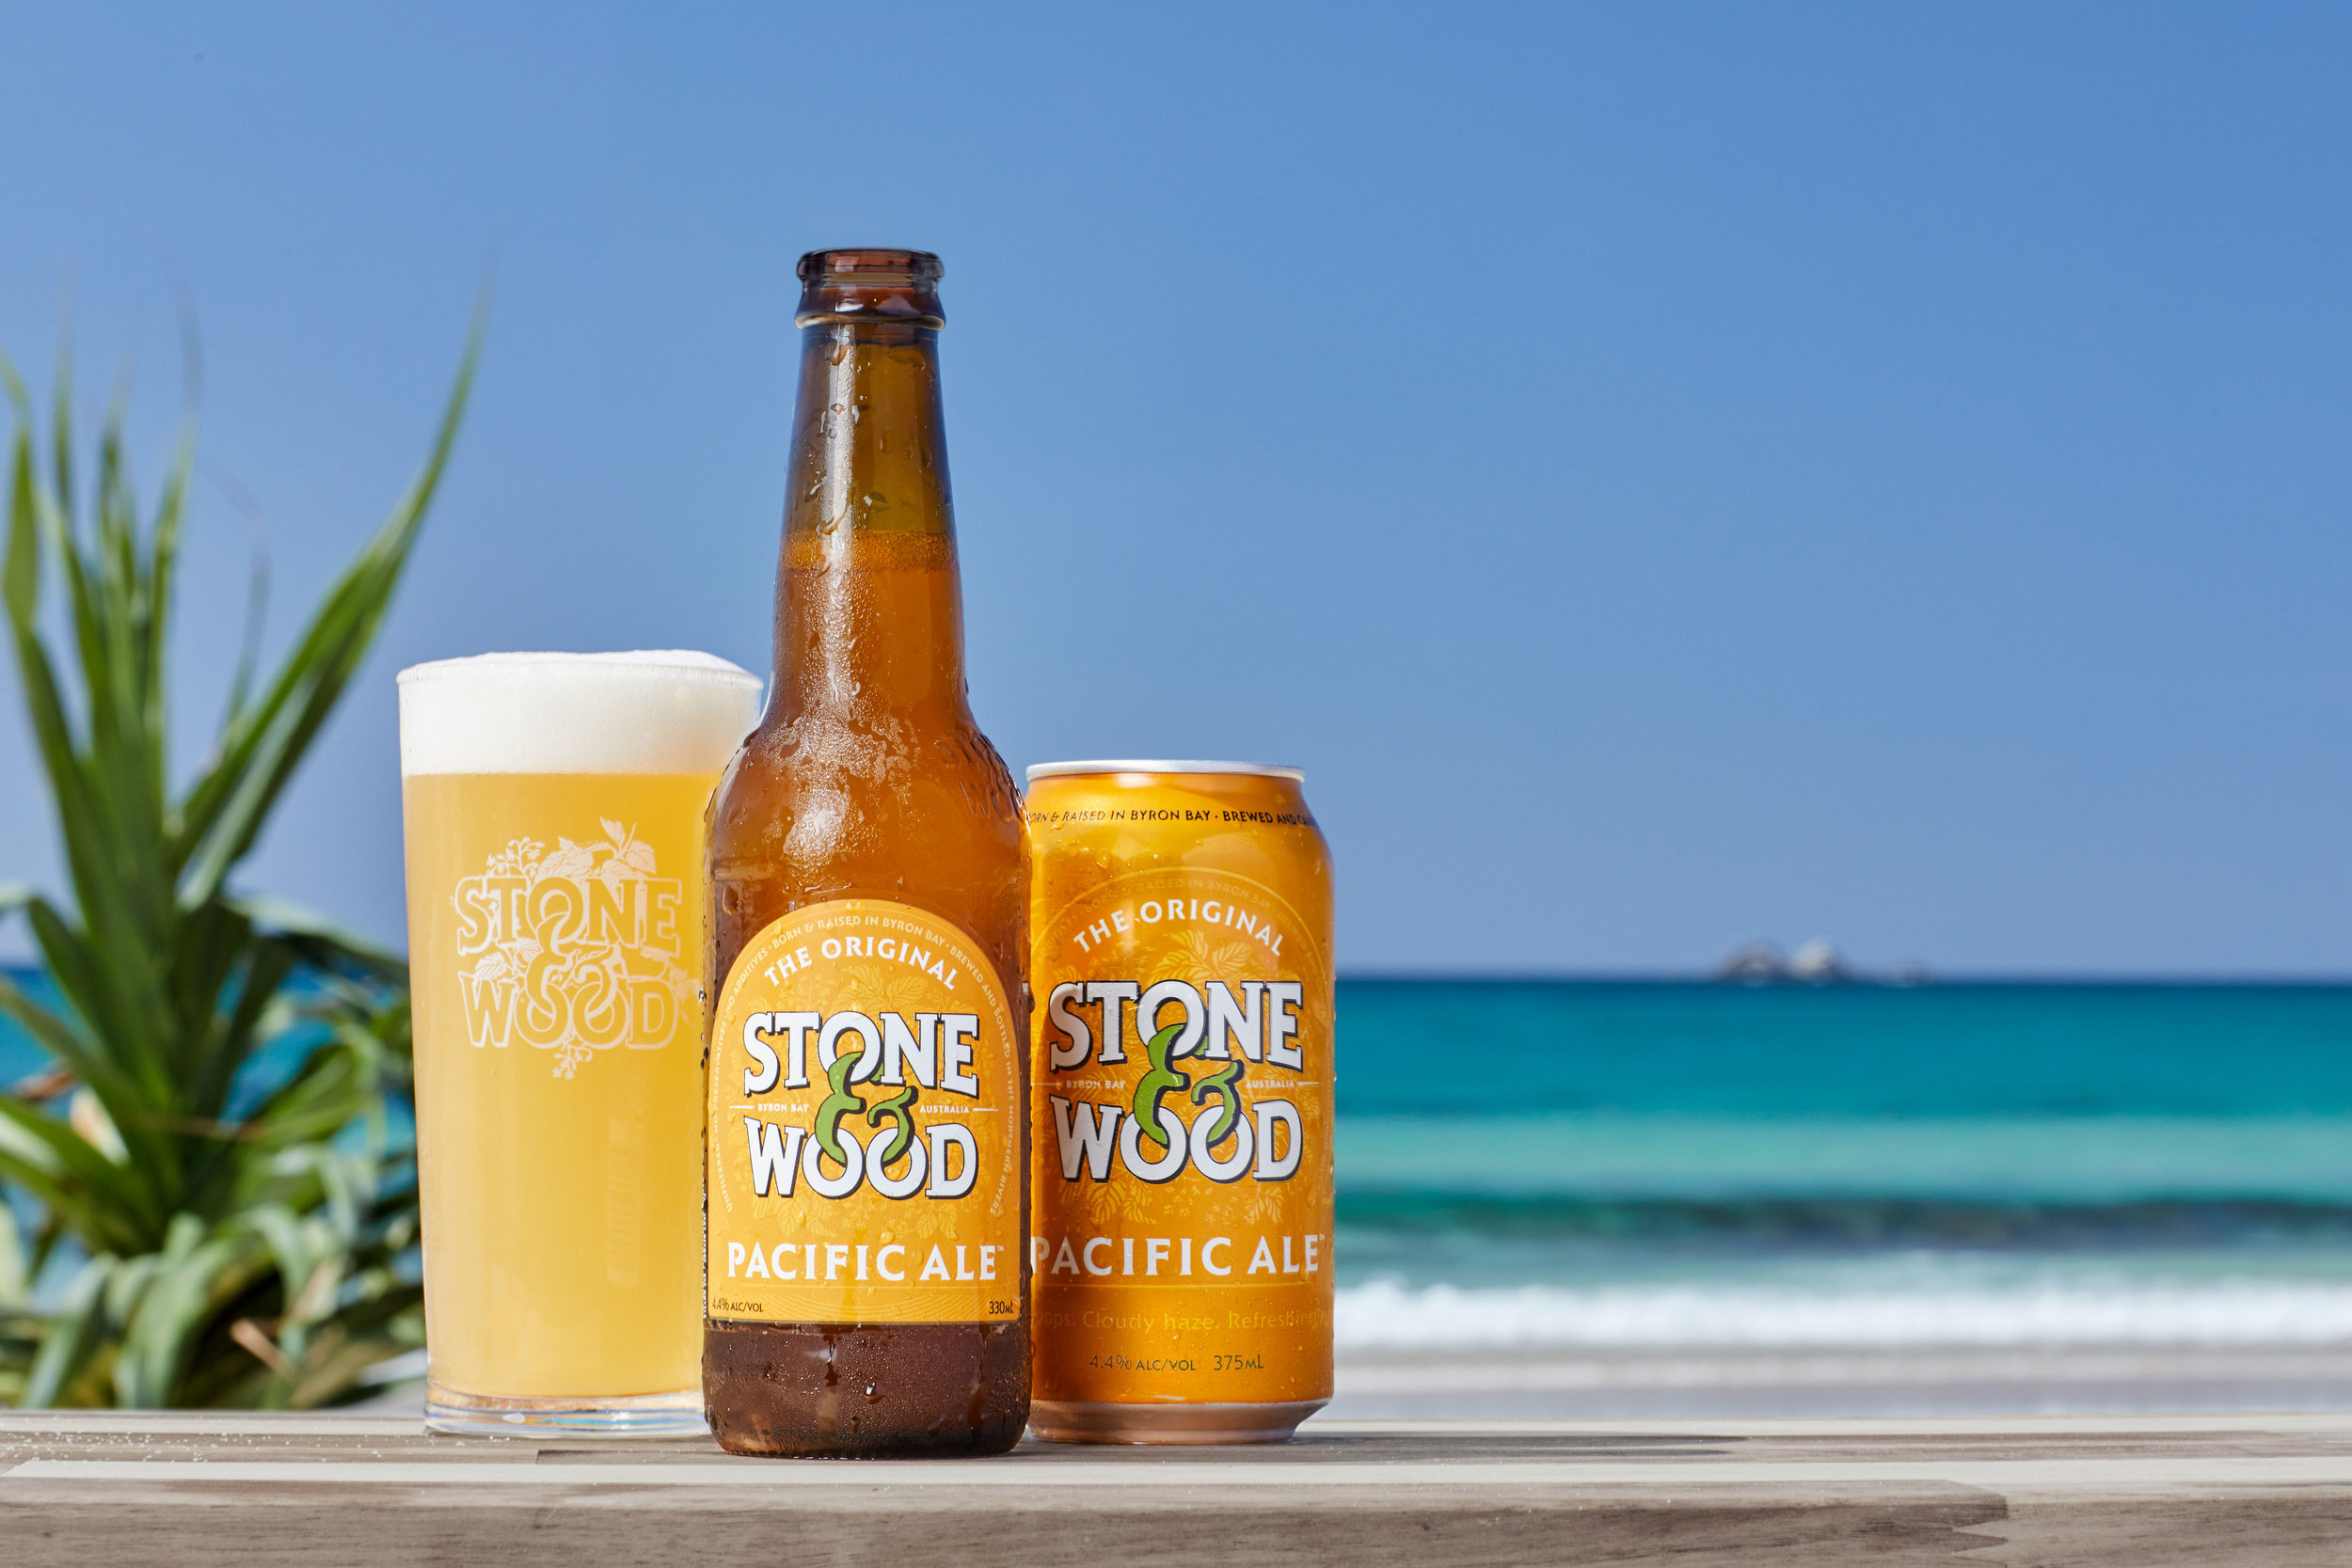 181212_Stone&Wood5150_Edit.jpg